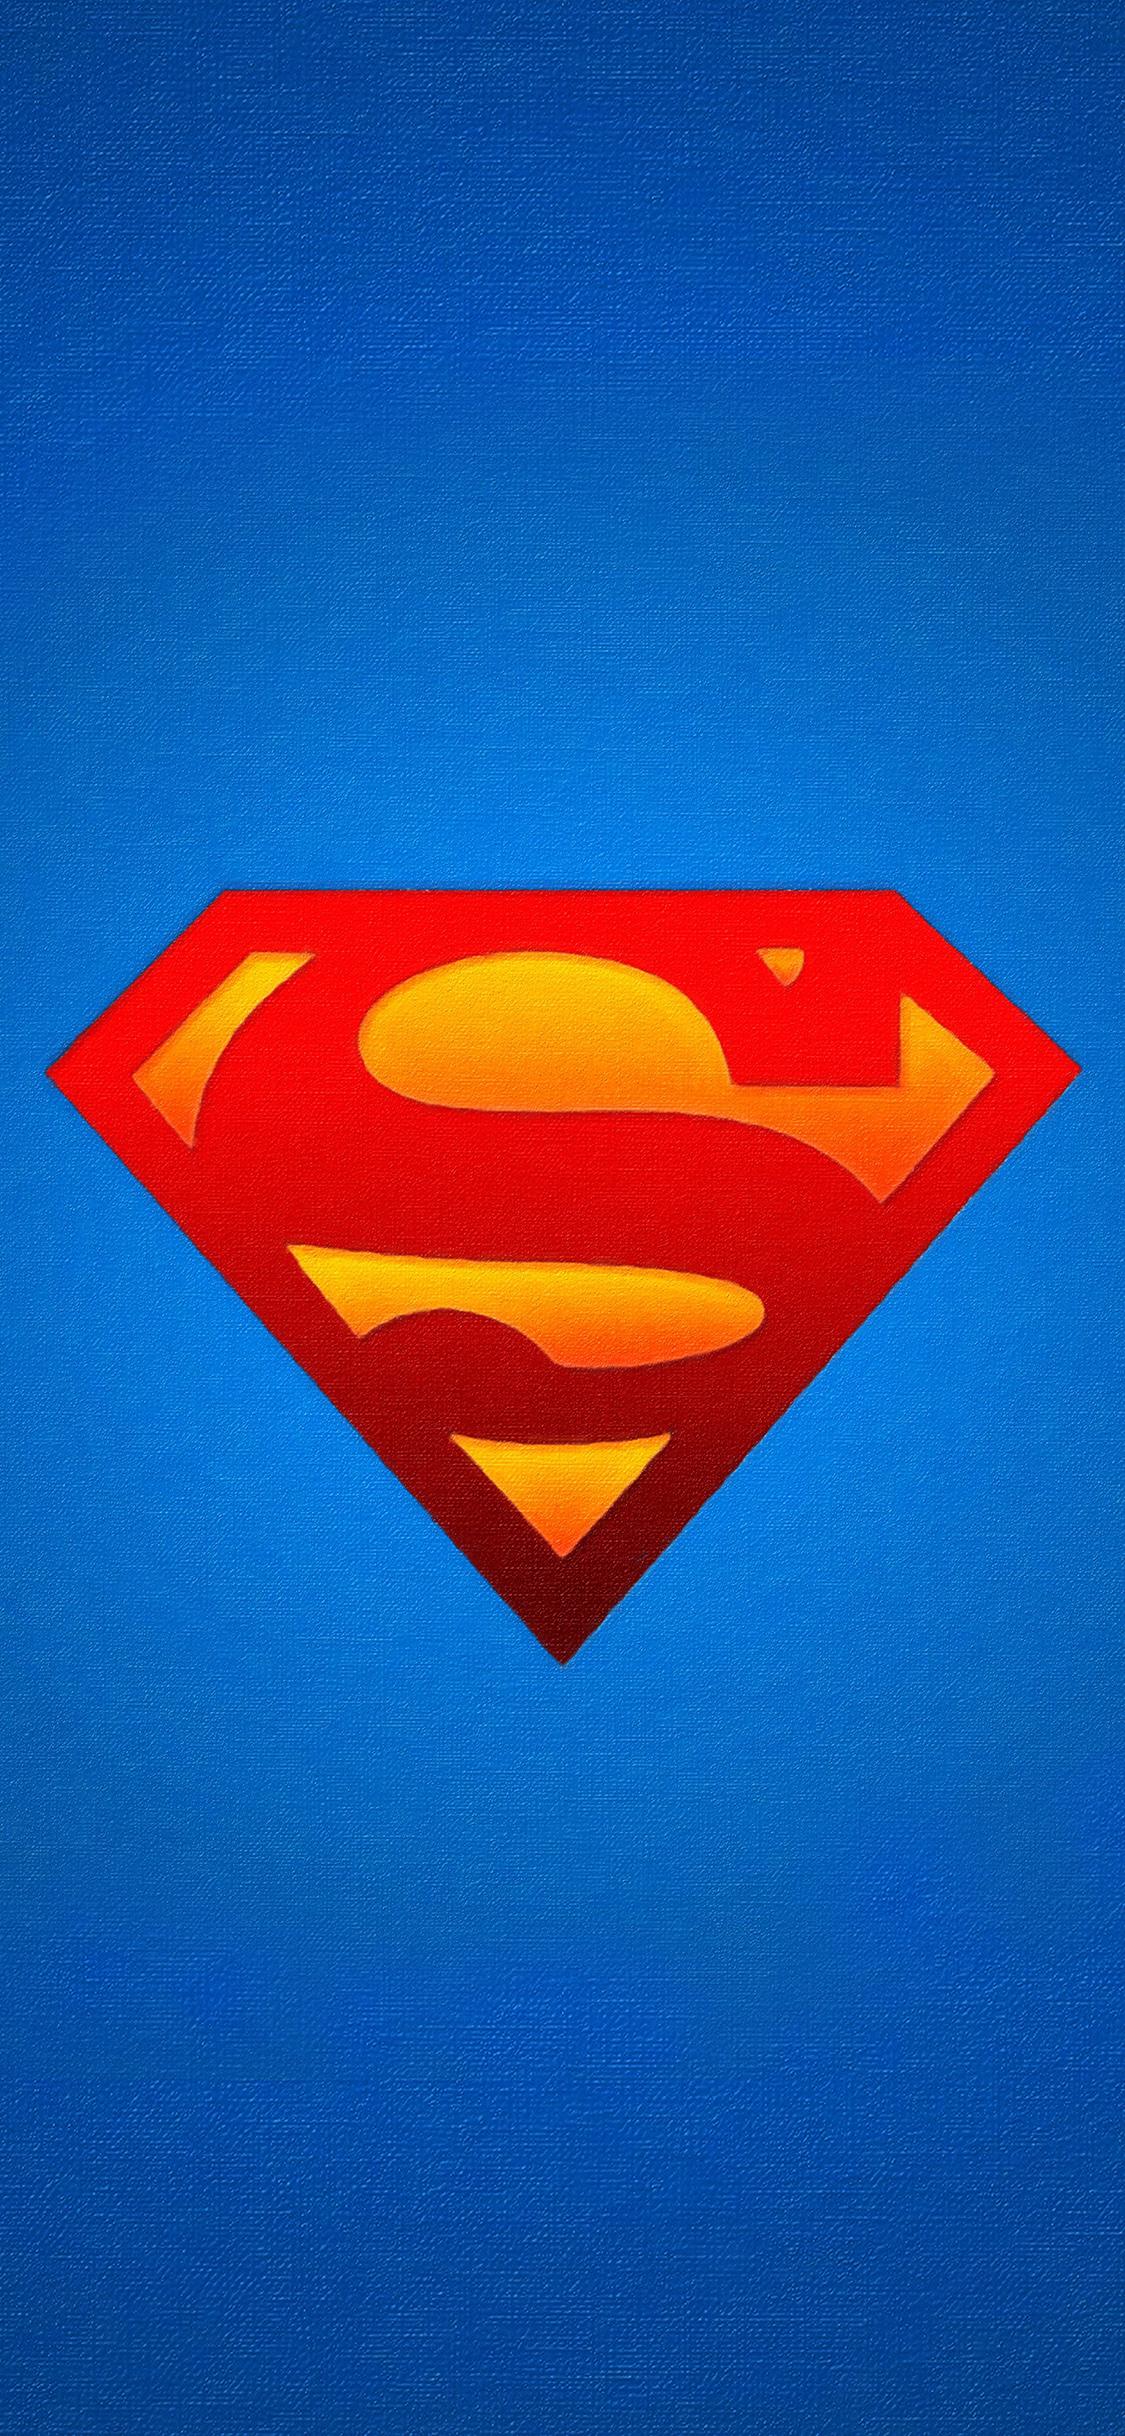 iPhoneXpapers.com-Apple-iPhone-wallpaper-av27-logo-superman-blue-red-hero-illustration-art